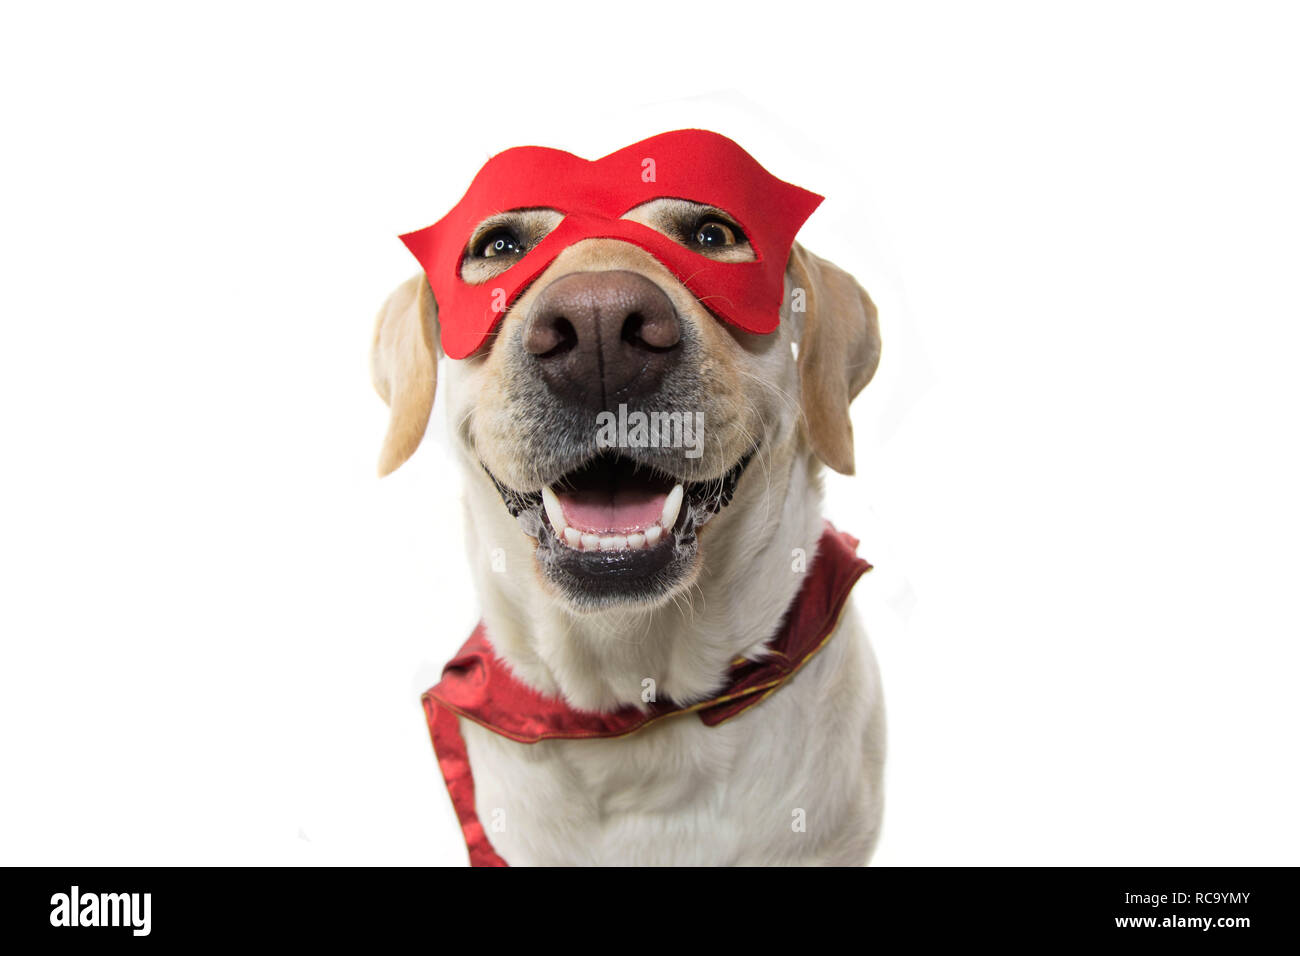 Costume De Super Héros De Chien Labrador Close Up Portant Un Masque